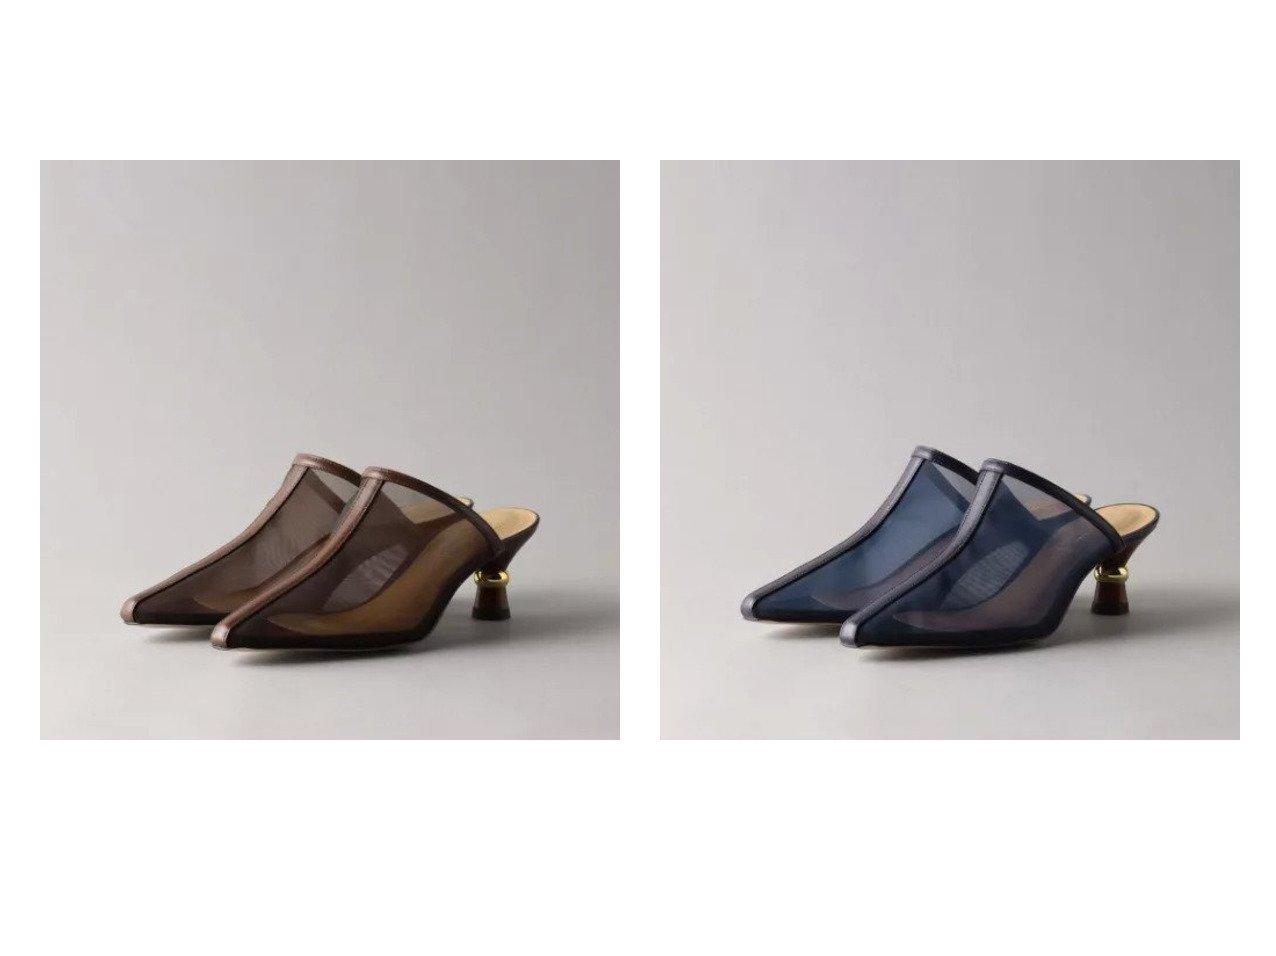 【Odette e Odile/オデット エ オディール】のOID シアーミュール パンプス55 【シューズ・靴】おすすめ!人気、トレンド・レディースファッションの通販 おすすめで人気の流行・トレンド、ファッションの通販商品 メンズファッション・キッズファッション・インテリア・家具・レディースファッション・服の通販 founy(ファニー) https://founy.com/ ファッション Fashion レディースファッション WOMEN ウッド シアー シューズ プリント メタル |ID:crp329100000031447